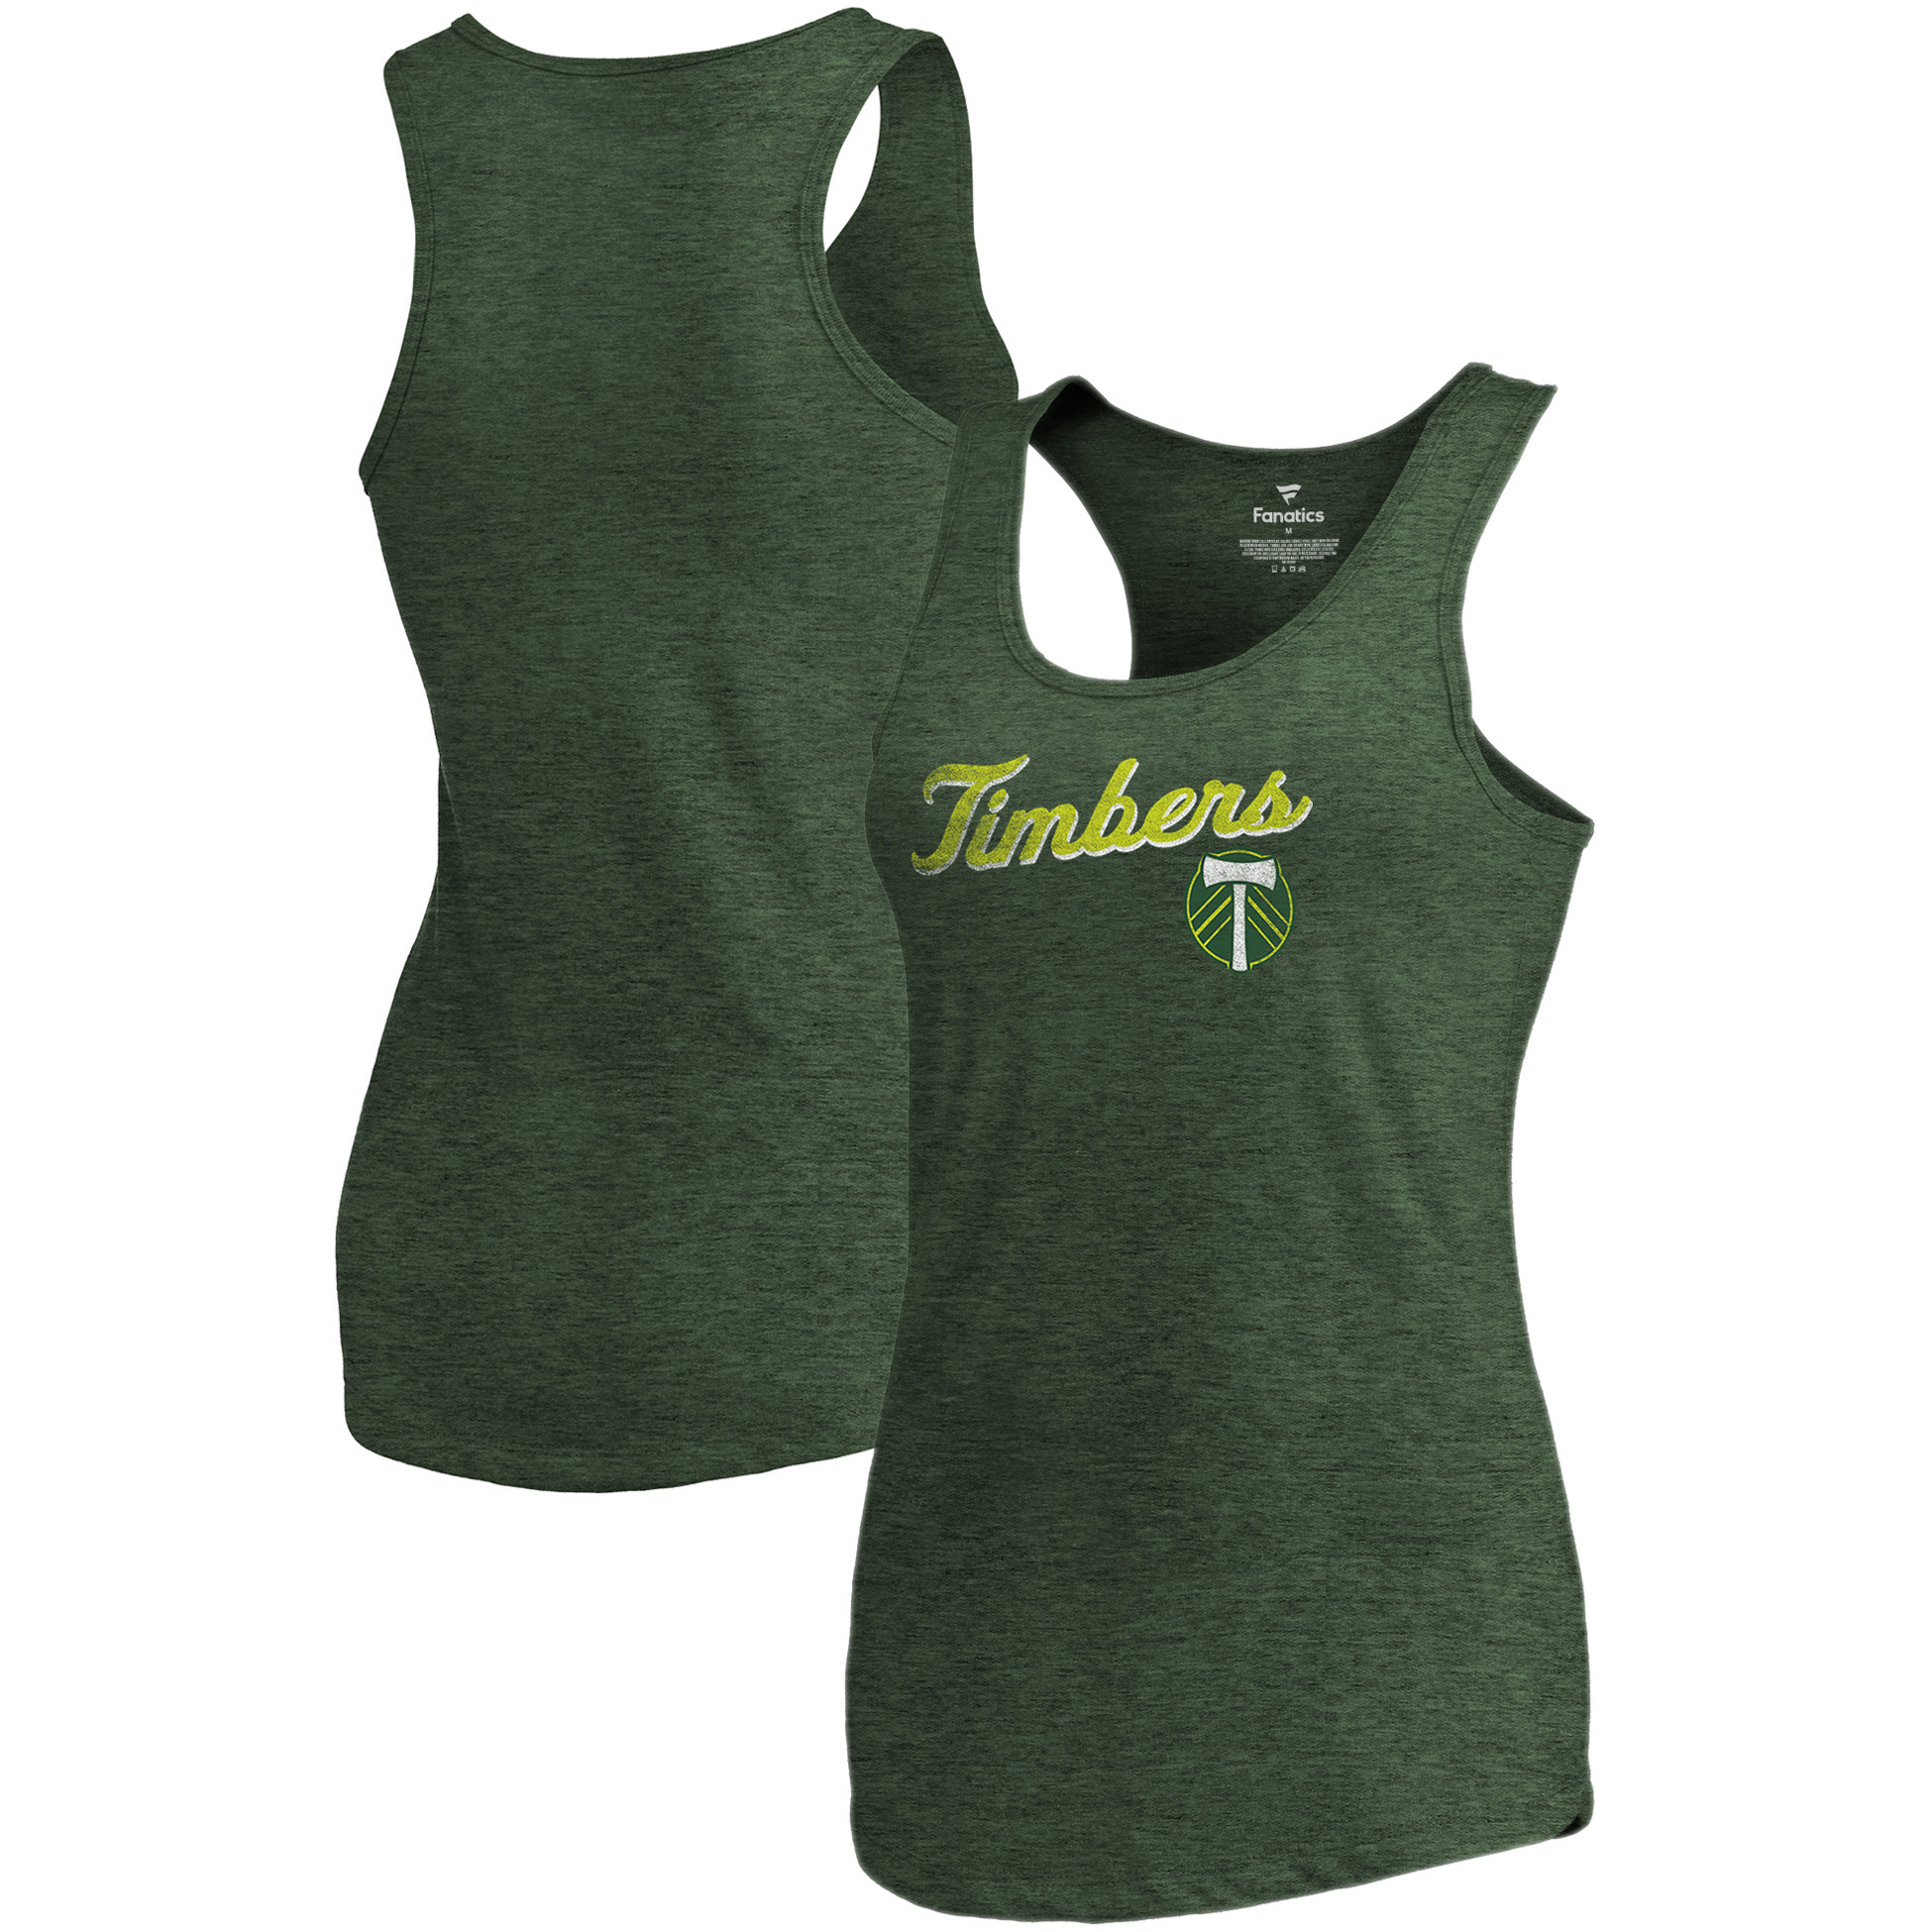 Portland Timbers Fanatics Branded Women's Rising Script Tri-Blend Tank Top - Heathered Green